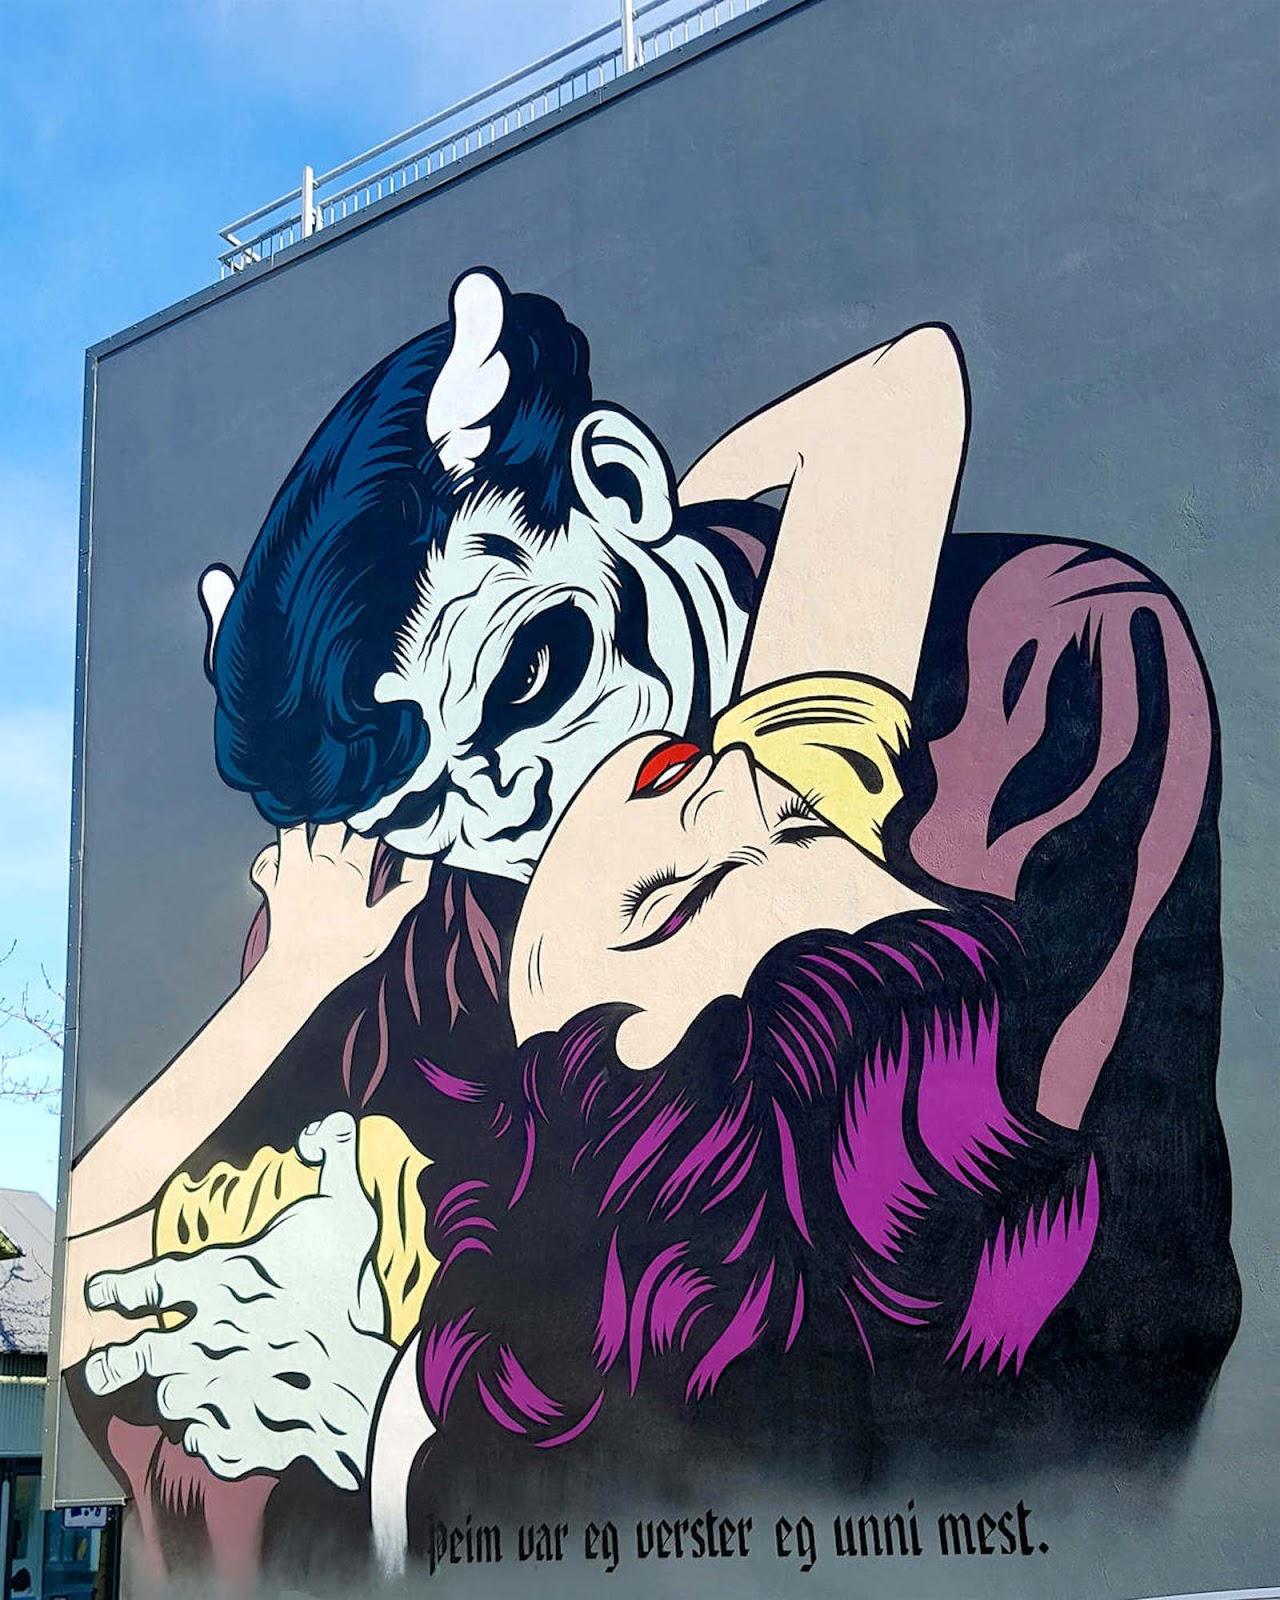 ufunk-reykjavik-street-art-7.jpg